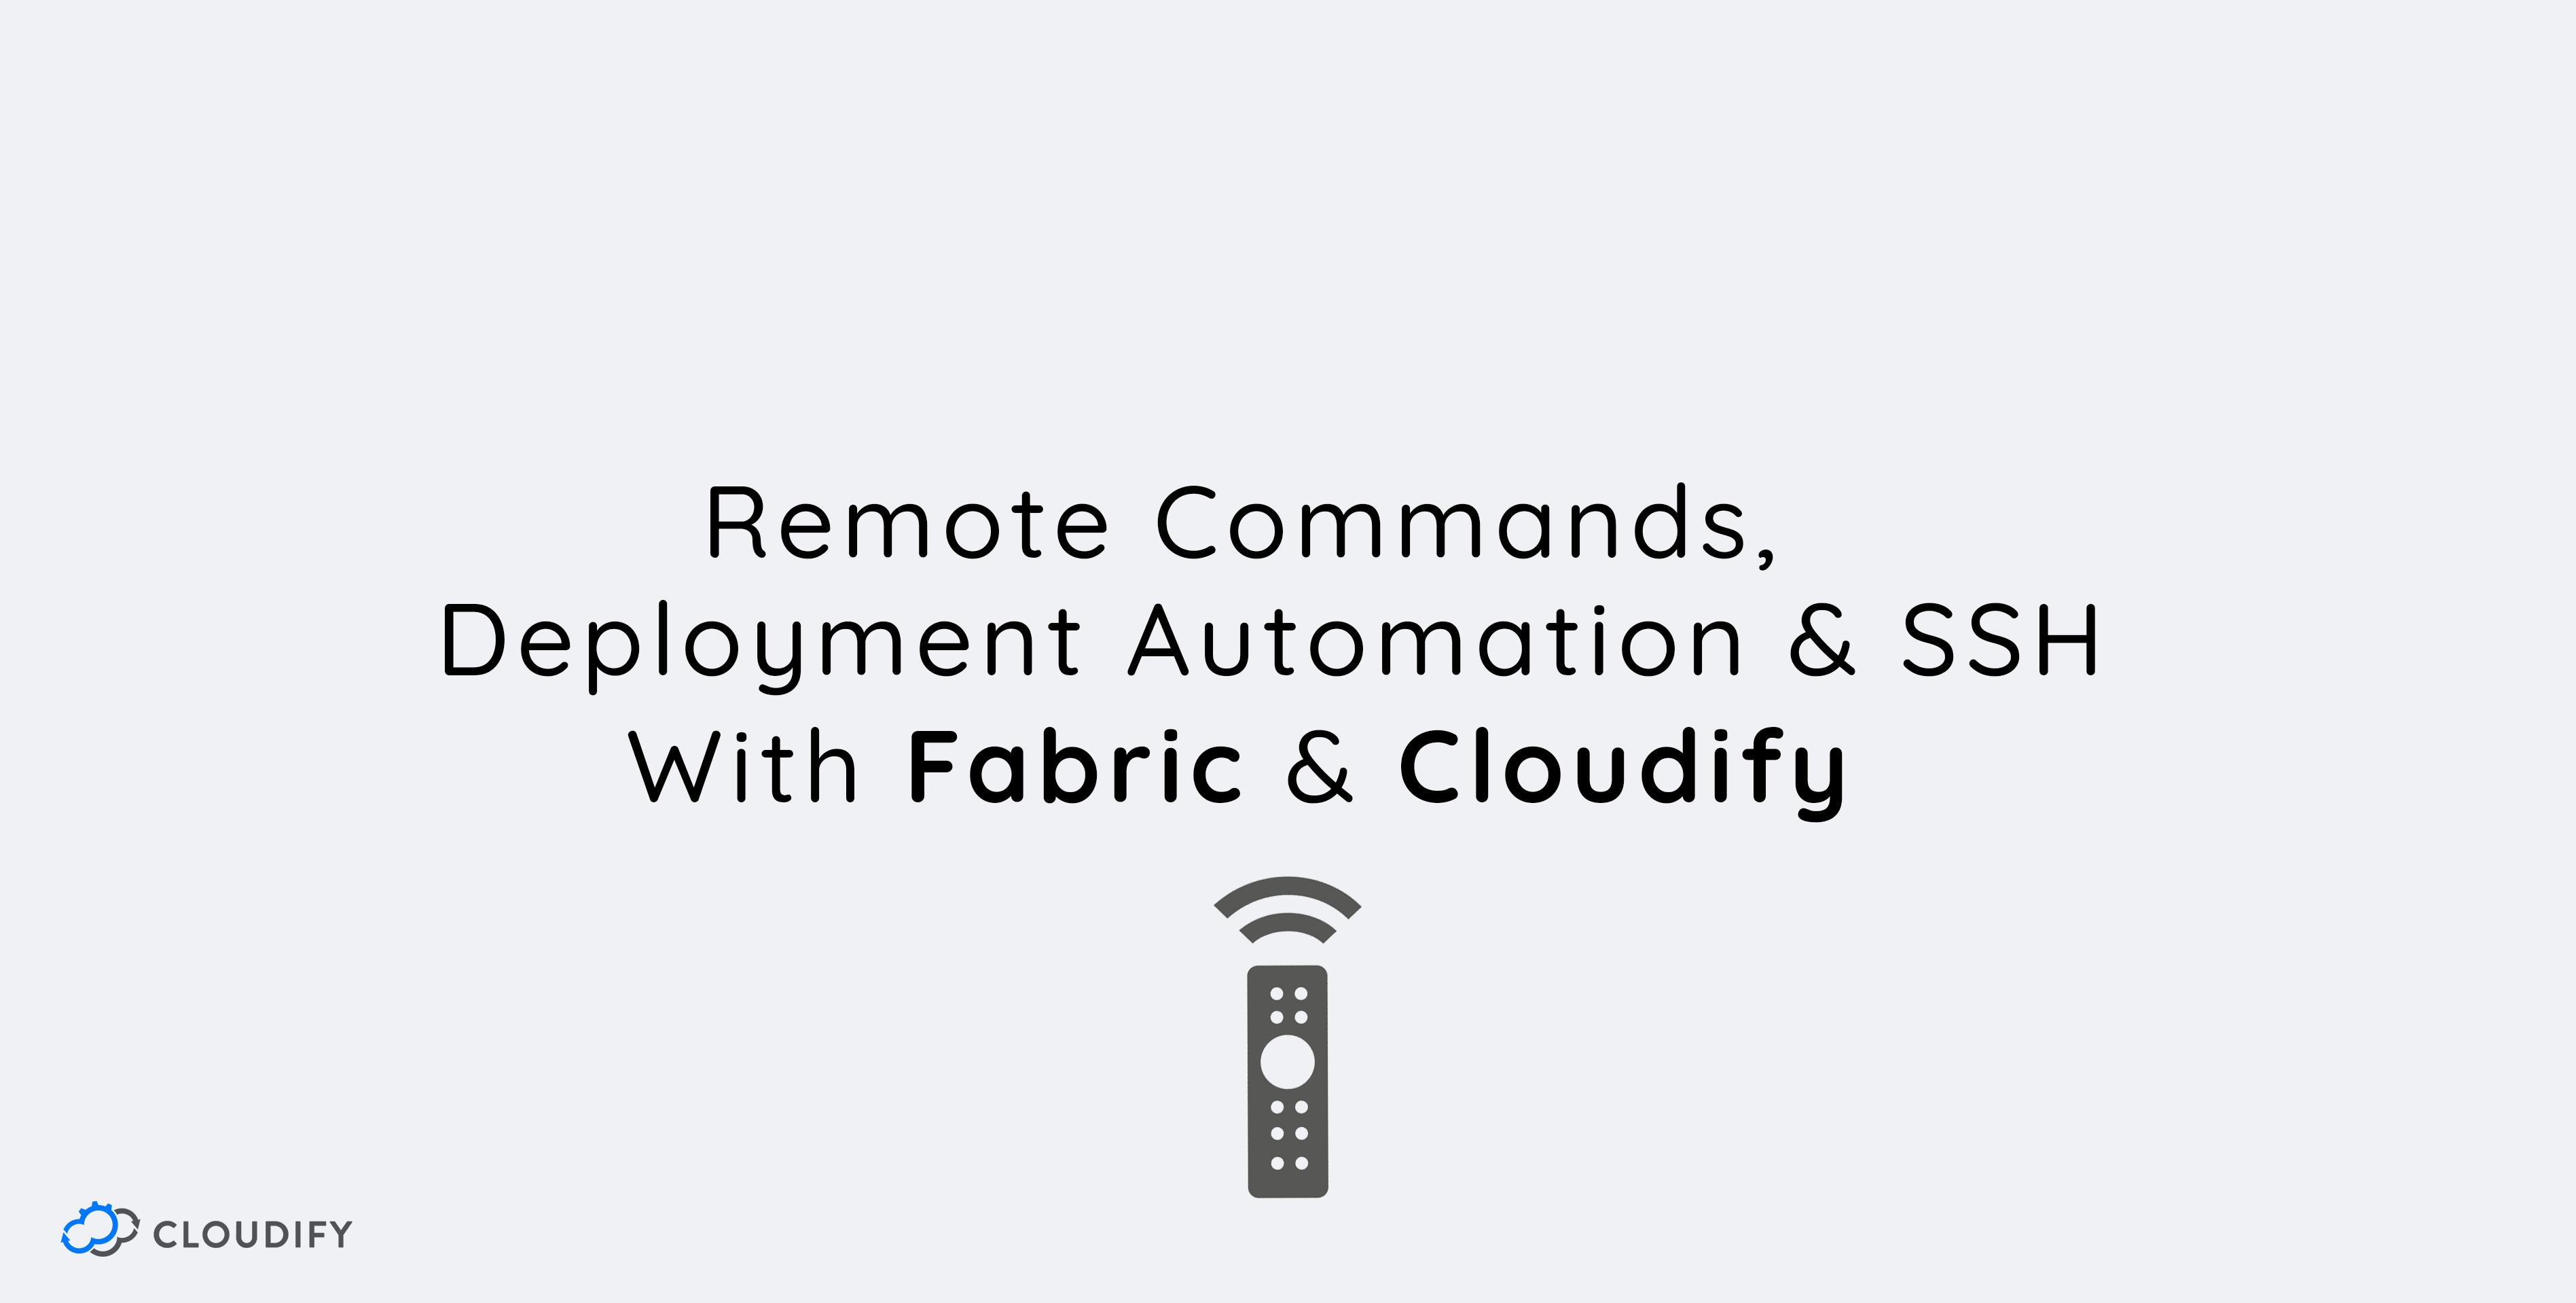 Remote Commands   SSH   Remote Execution   Script Fabric   Deployment Automation